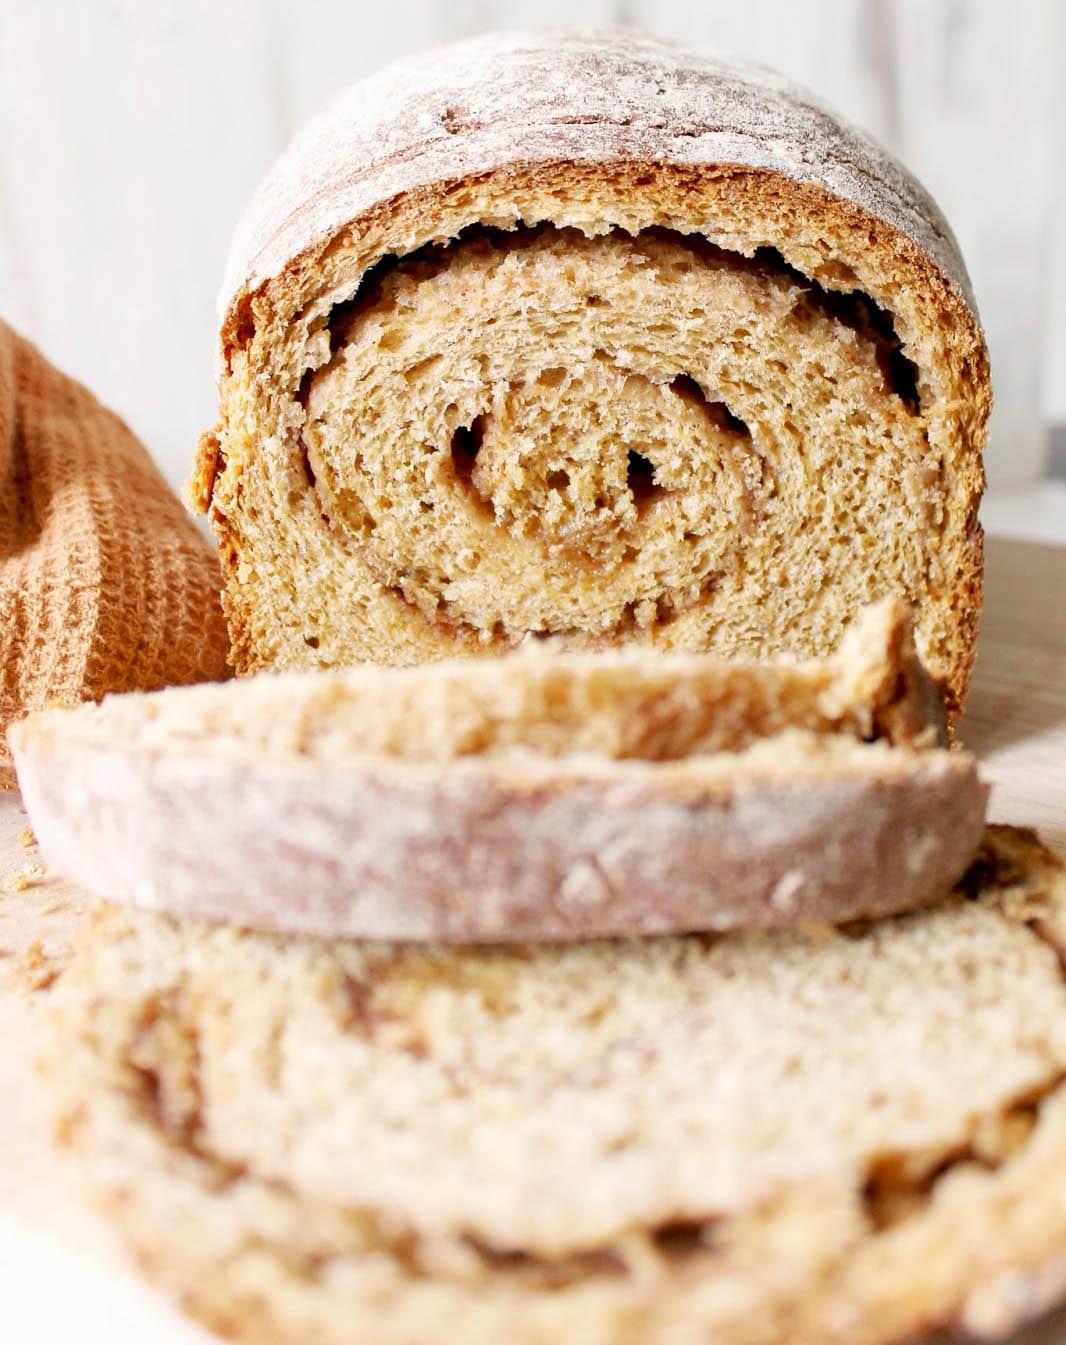 Cinnamon-Swirl Pumpkin Bread